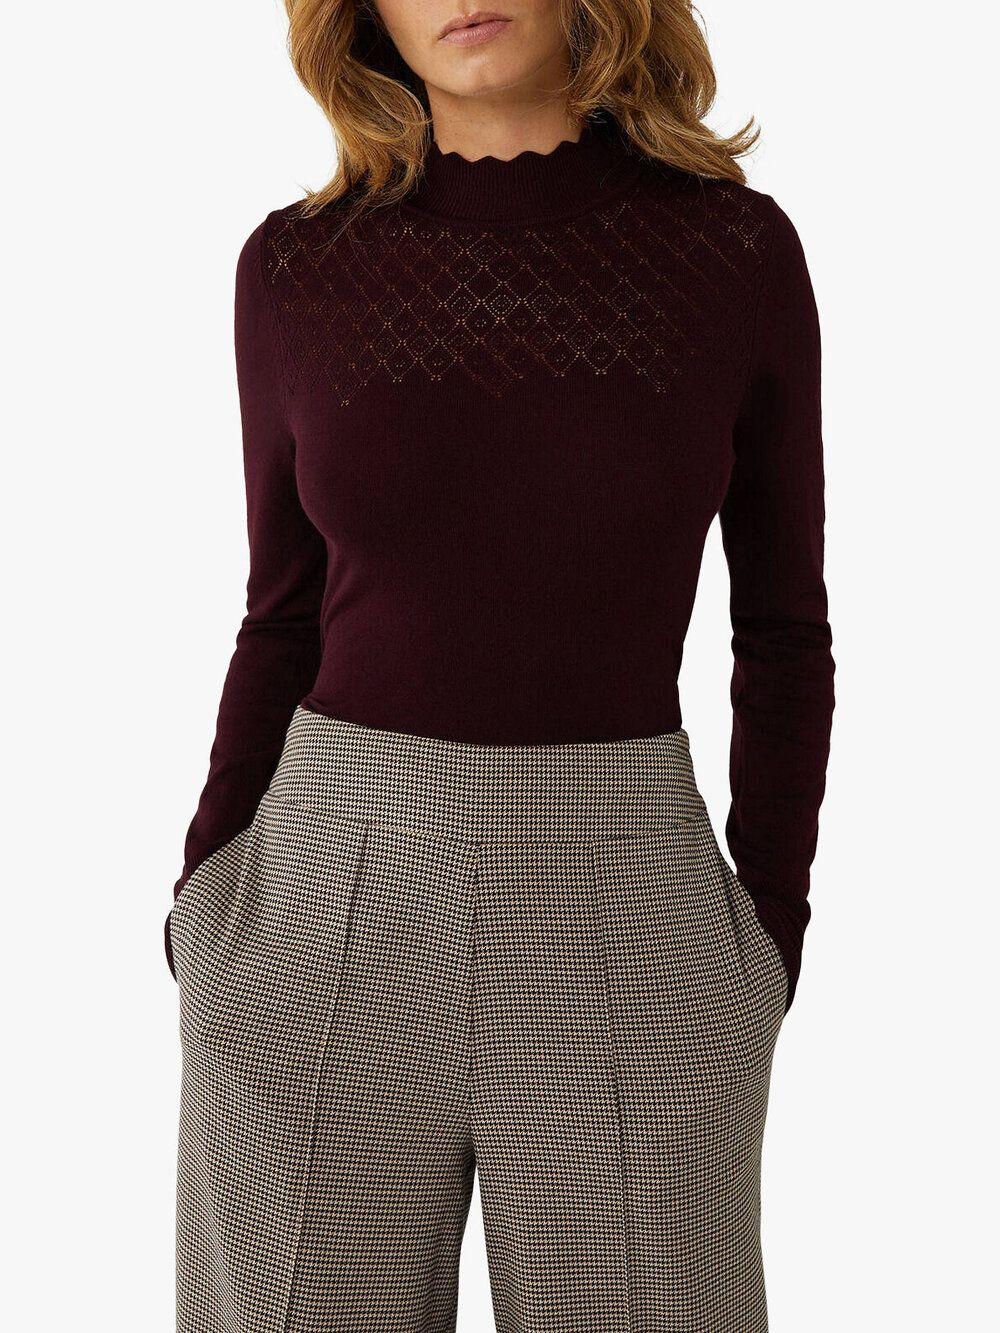 Nbsp Textured Sleeves Pointelle Sweater Knitwear Women